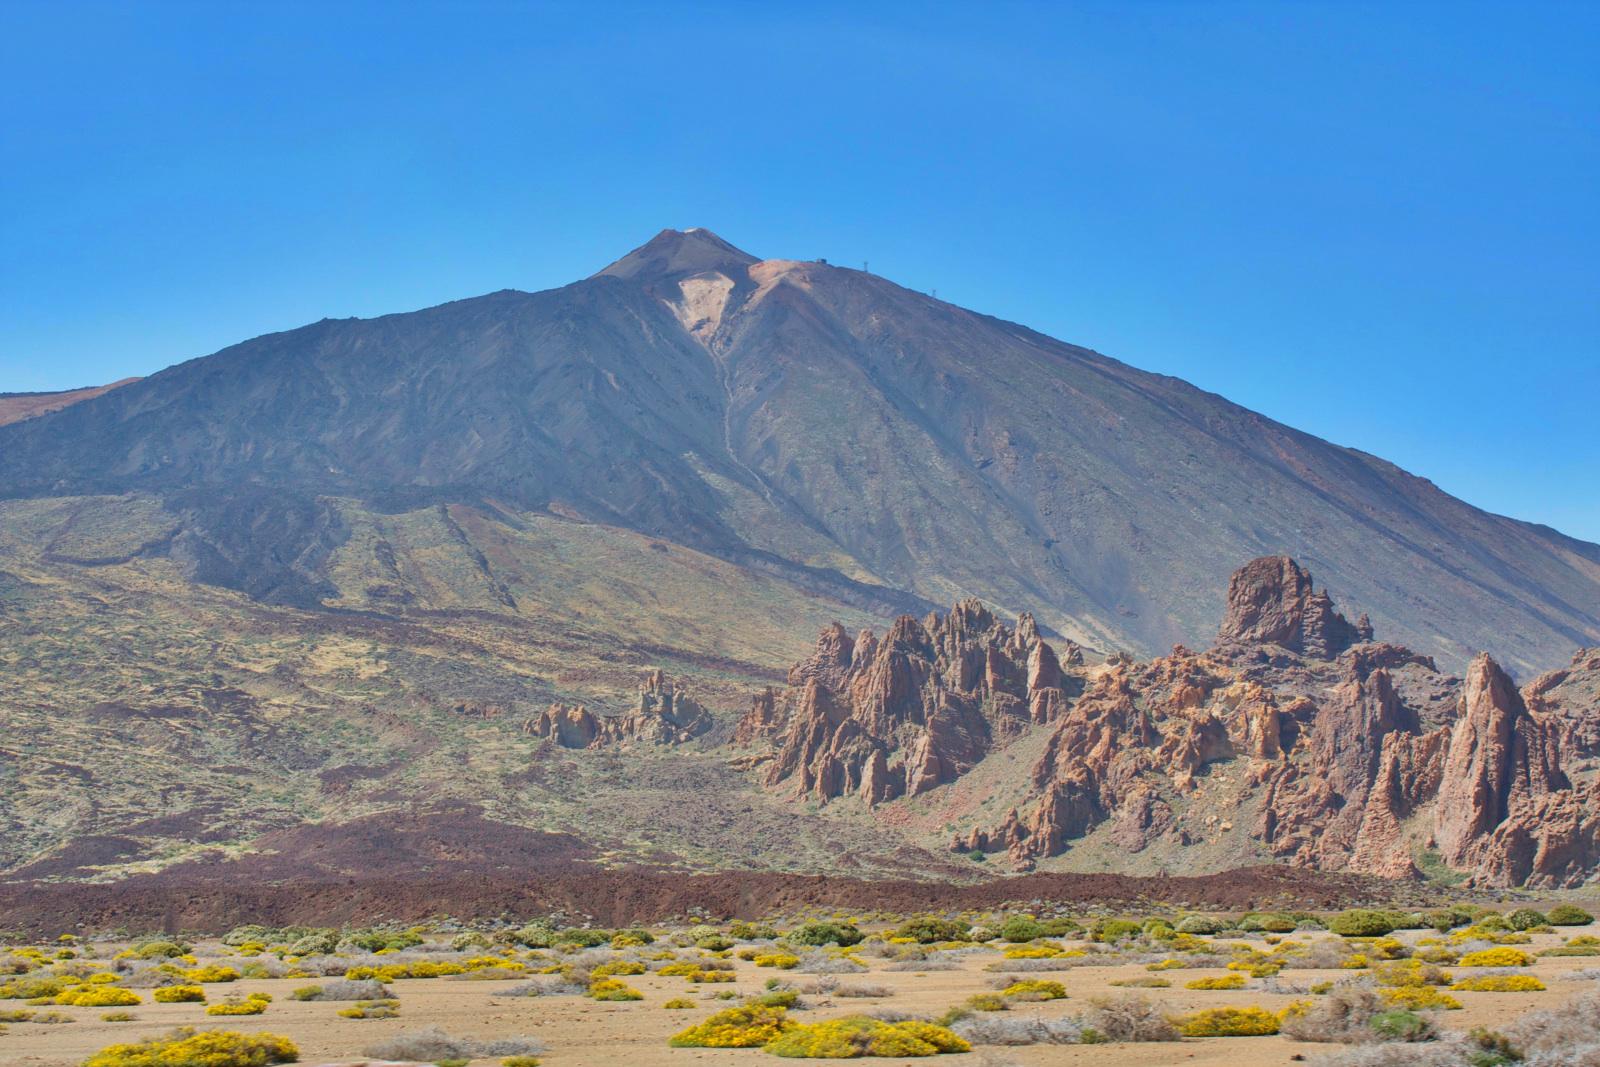 Pico del Teide, Santa Cruz de Tenerife